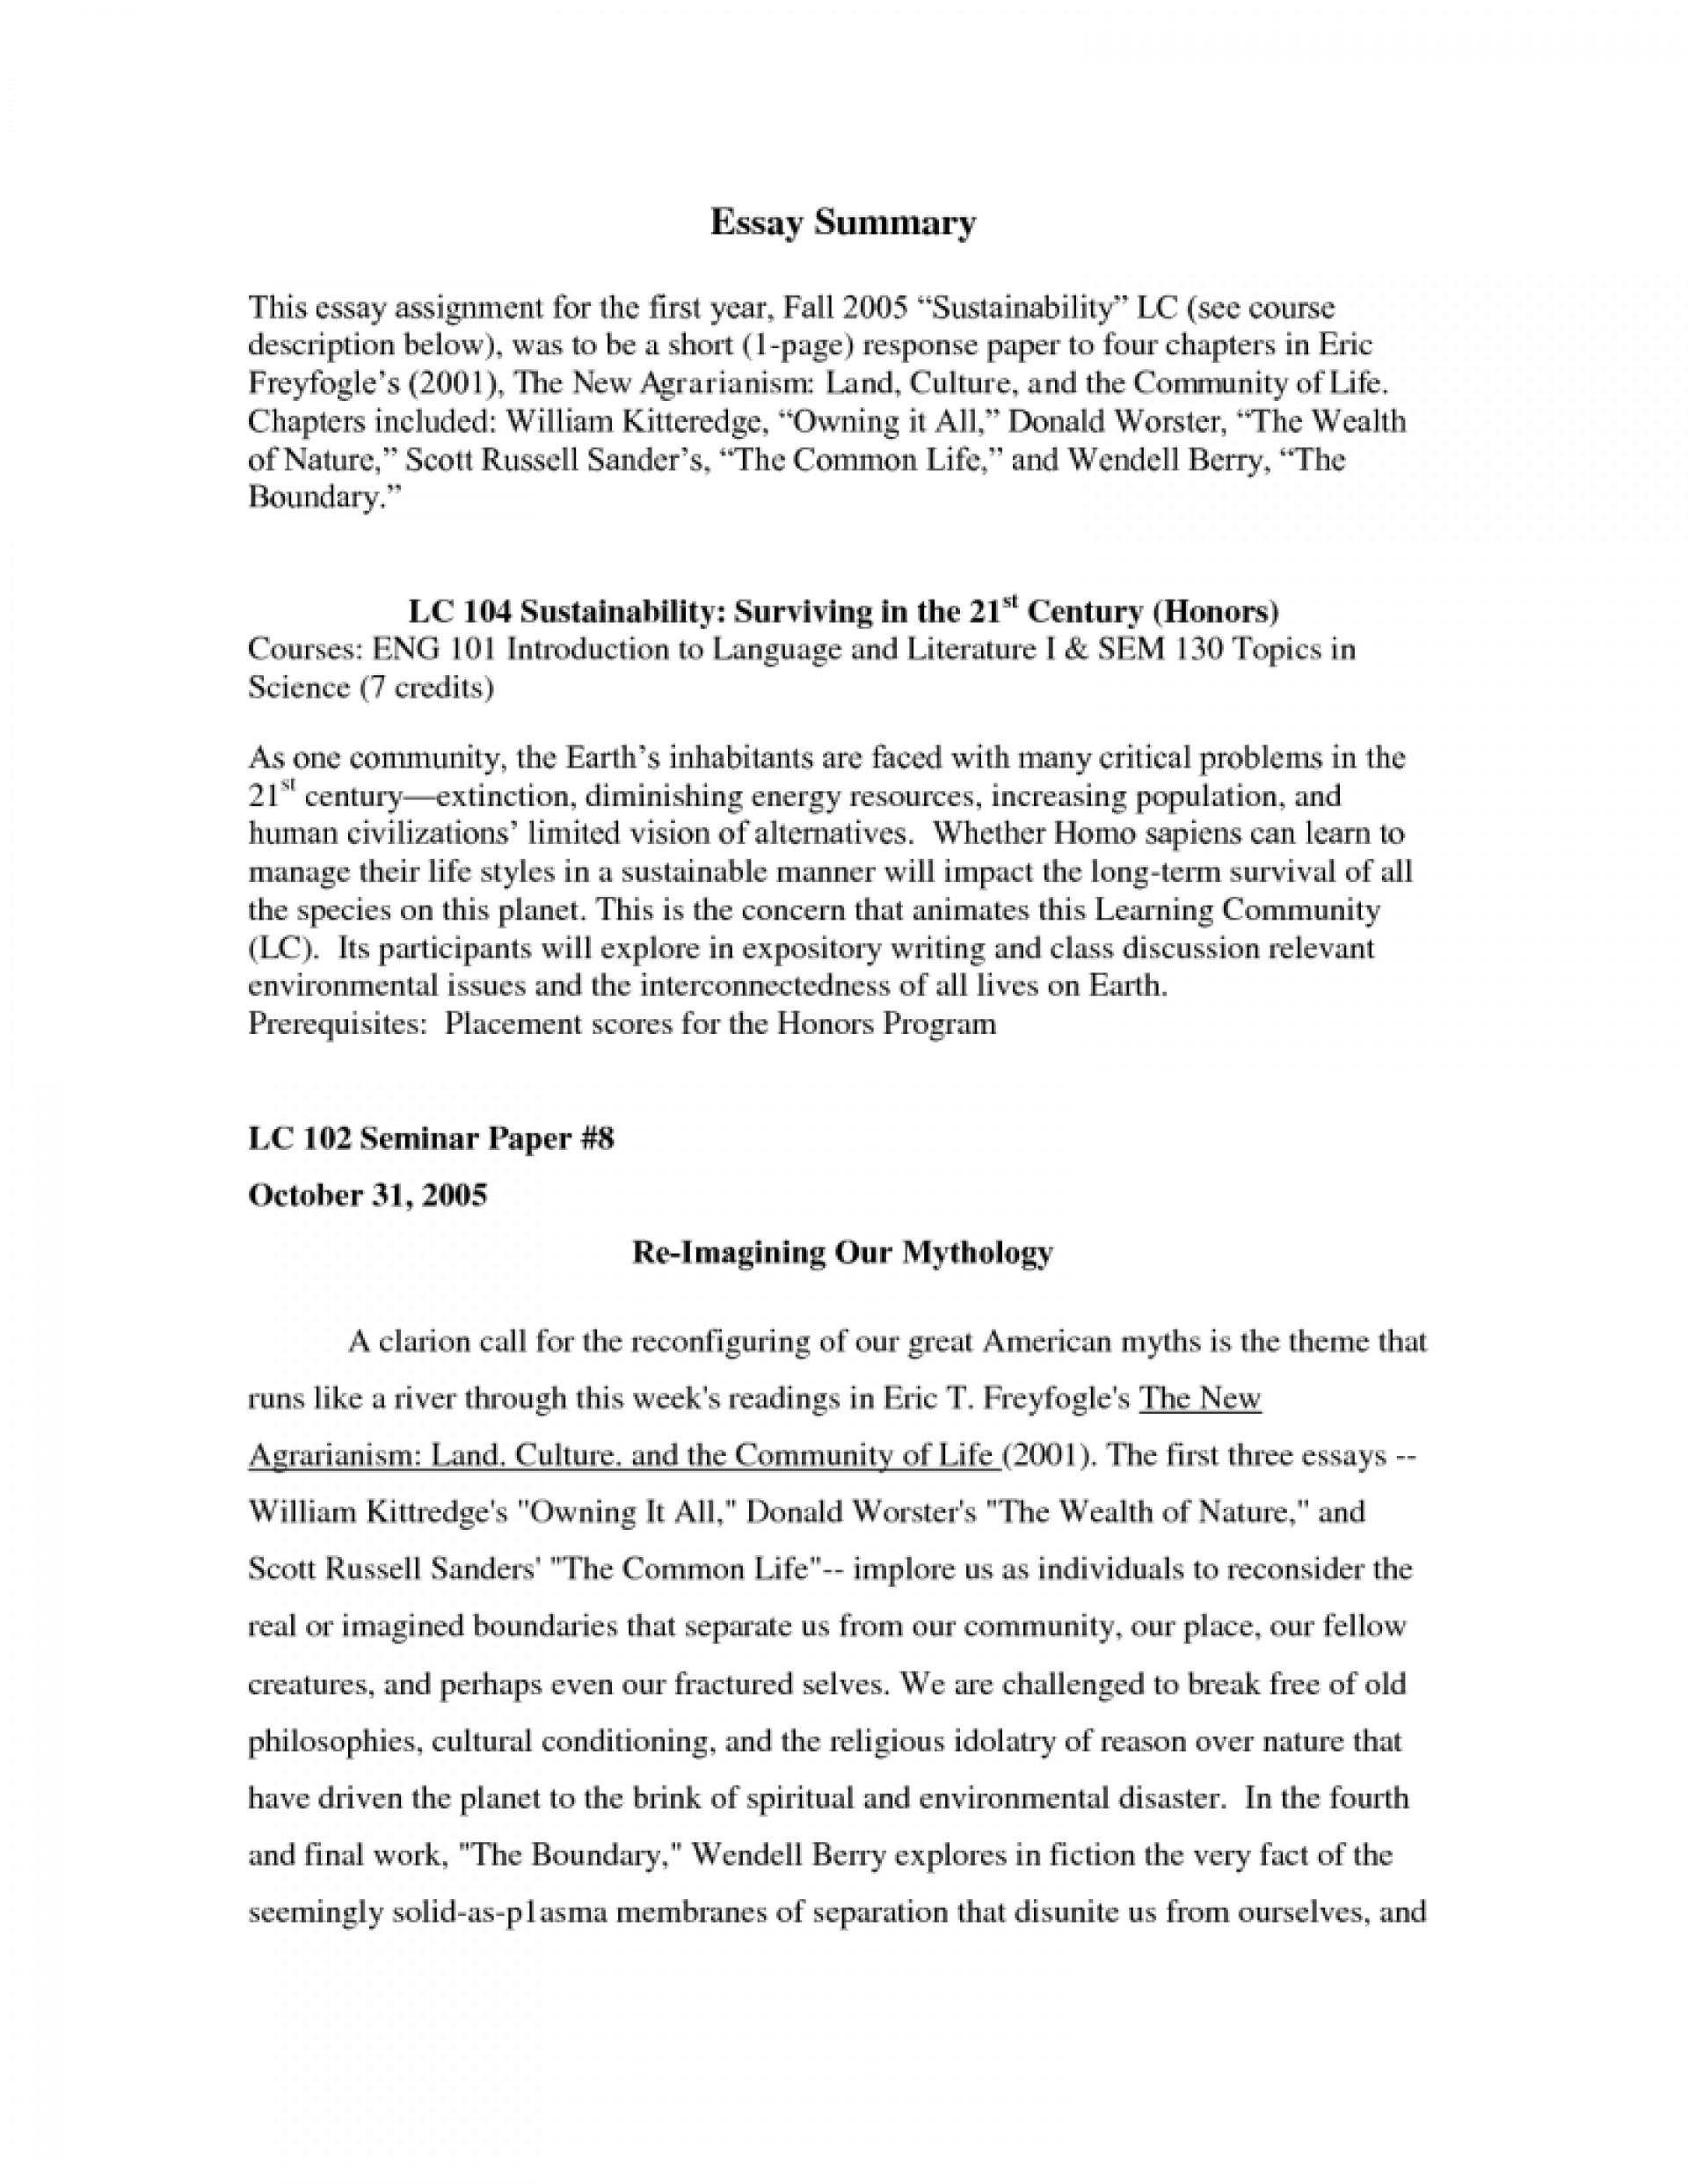 Summary analysis essay example